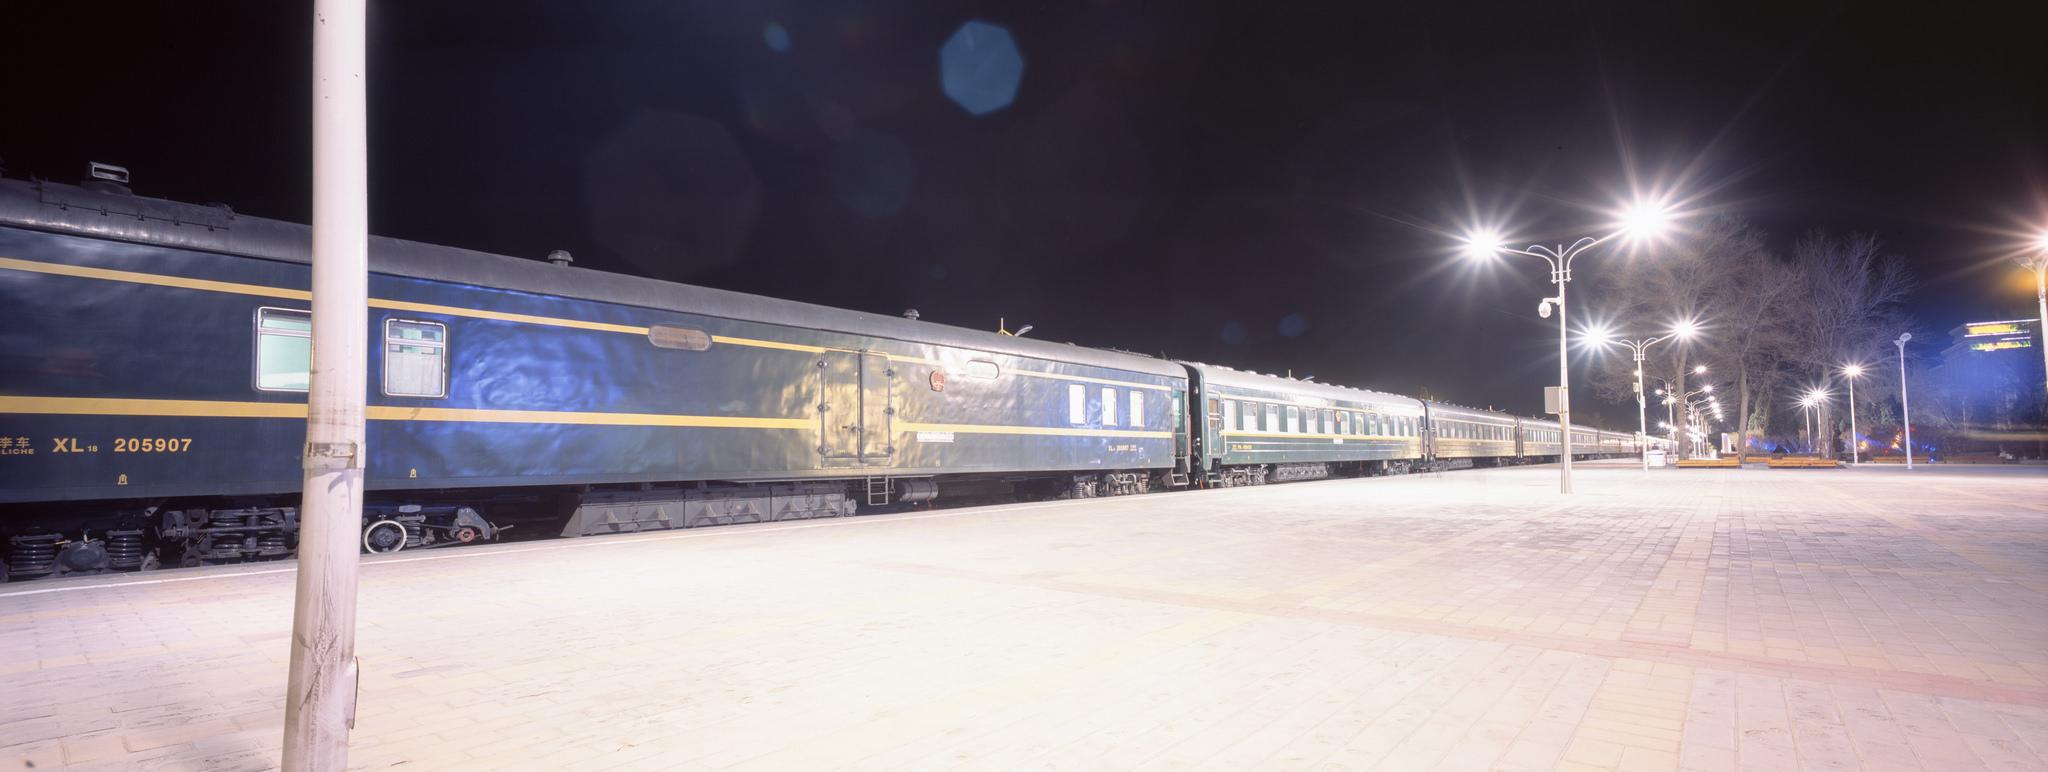 Our train in Erenhot, China P614   Super Angulon 58mm   Fuji Provia 100f